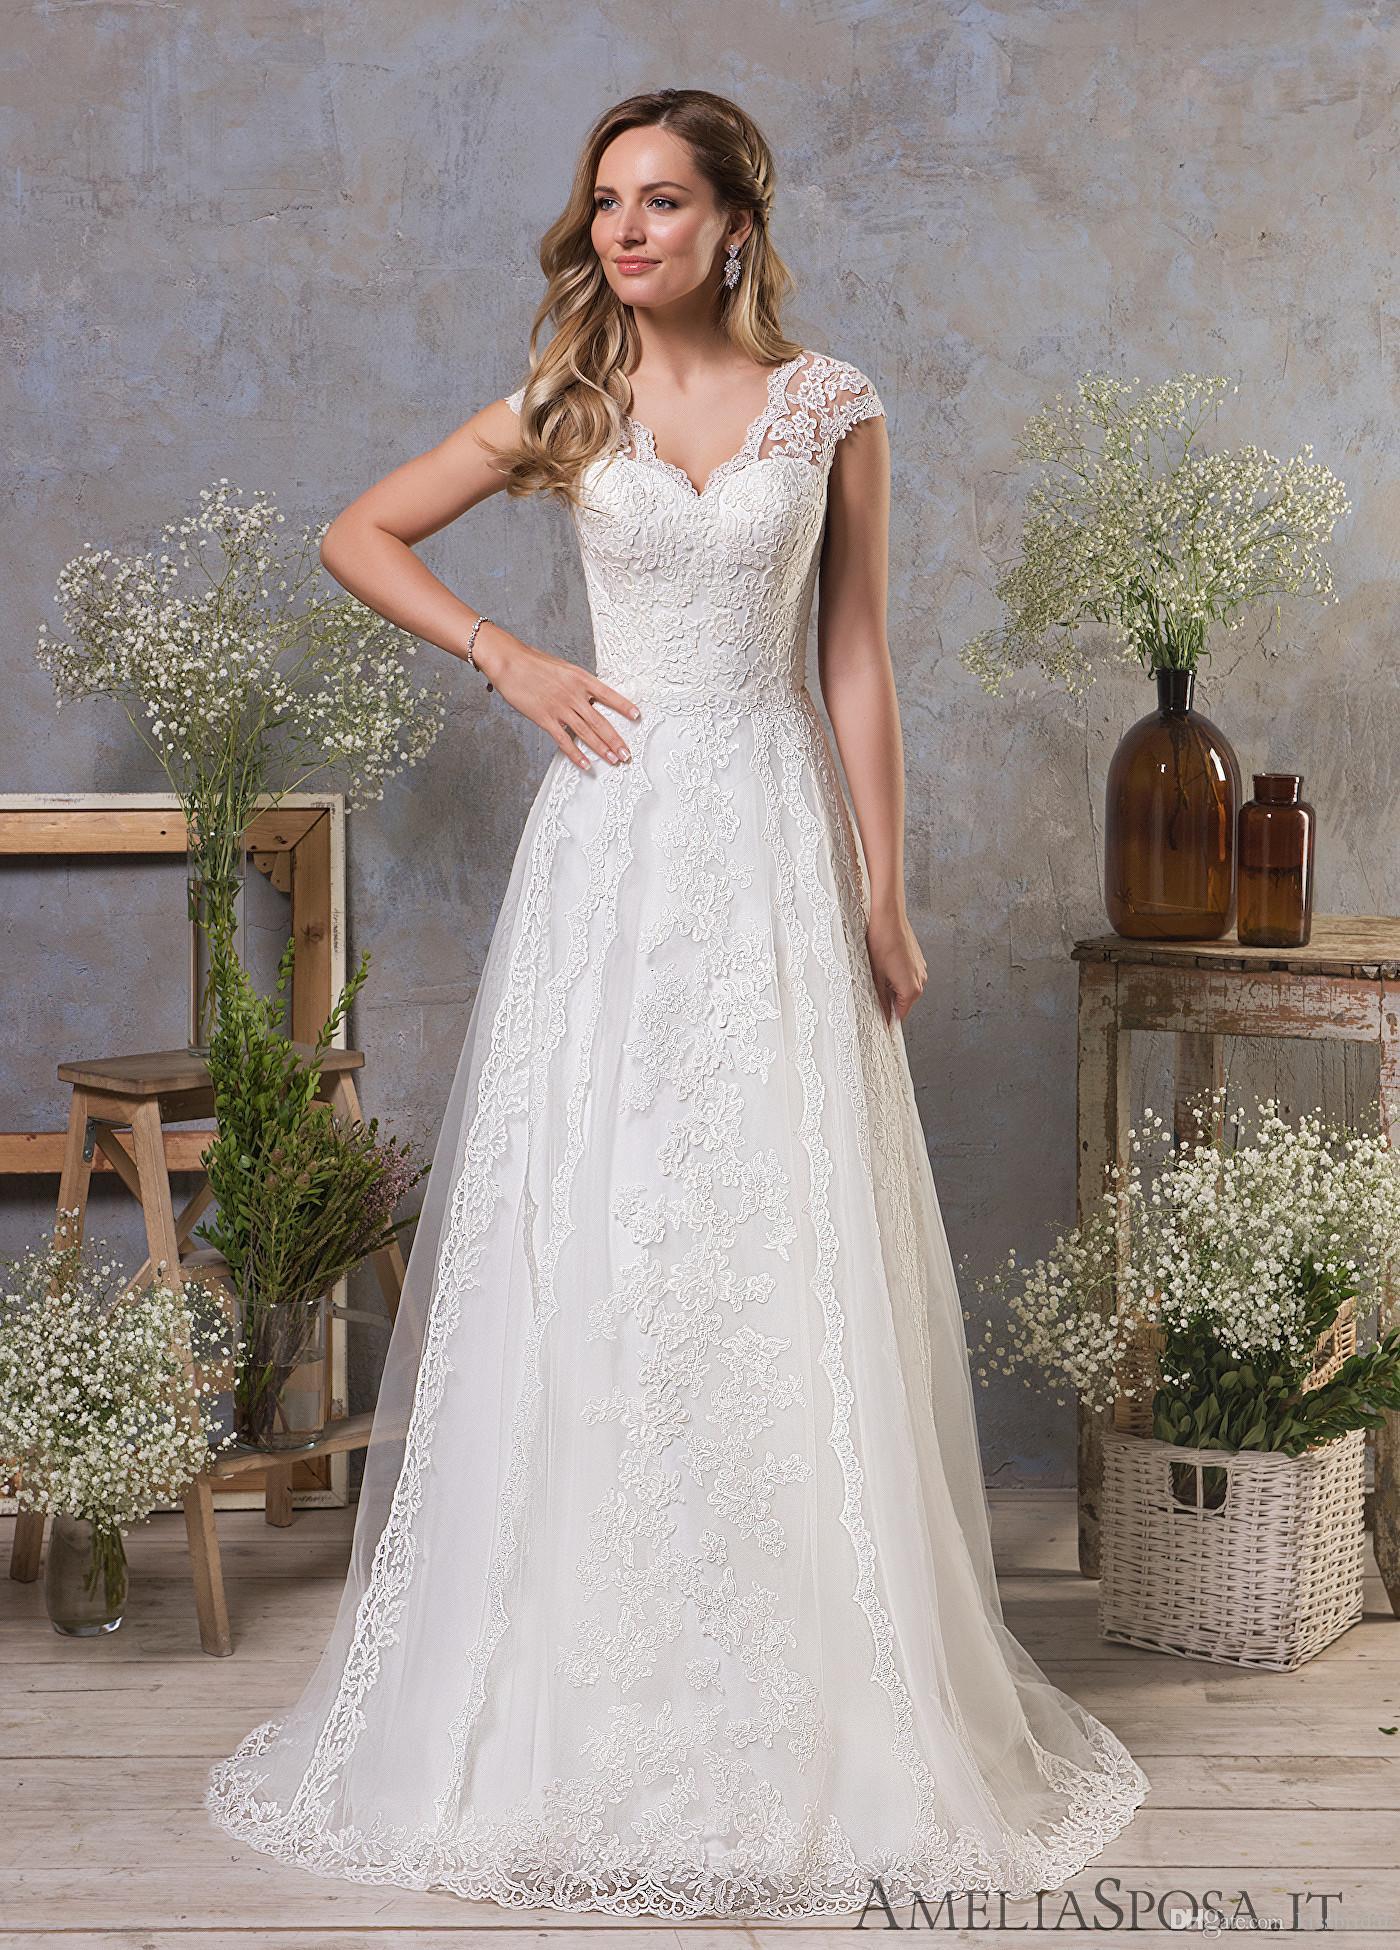 Vintage Lace Wedding Dresses A Line V Neck Short Sleeve Bridal Gowns with Open Back vestido de novia Country Corset Formal Dress